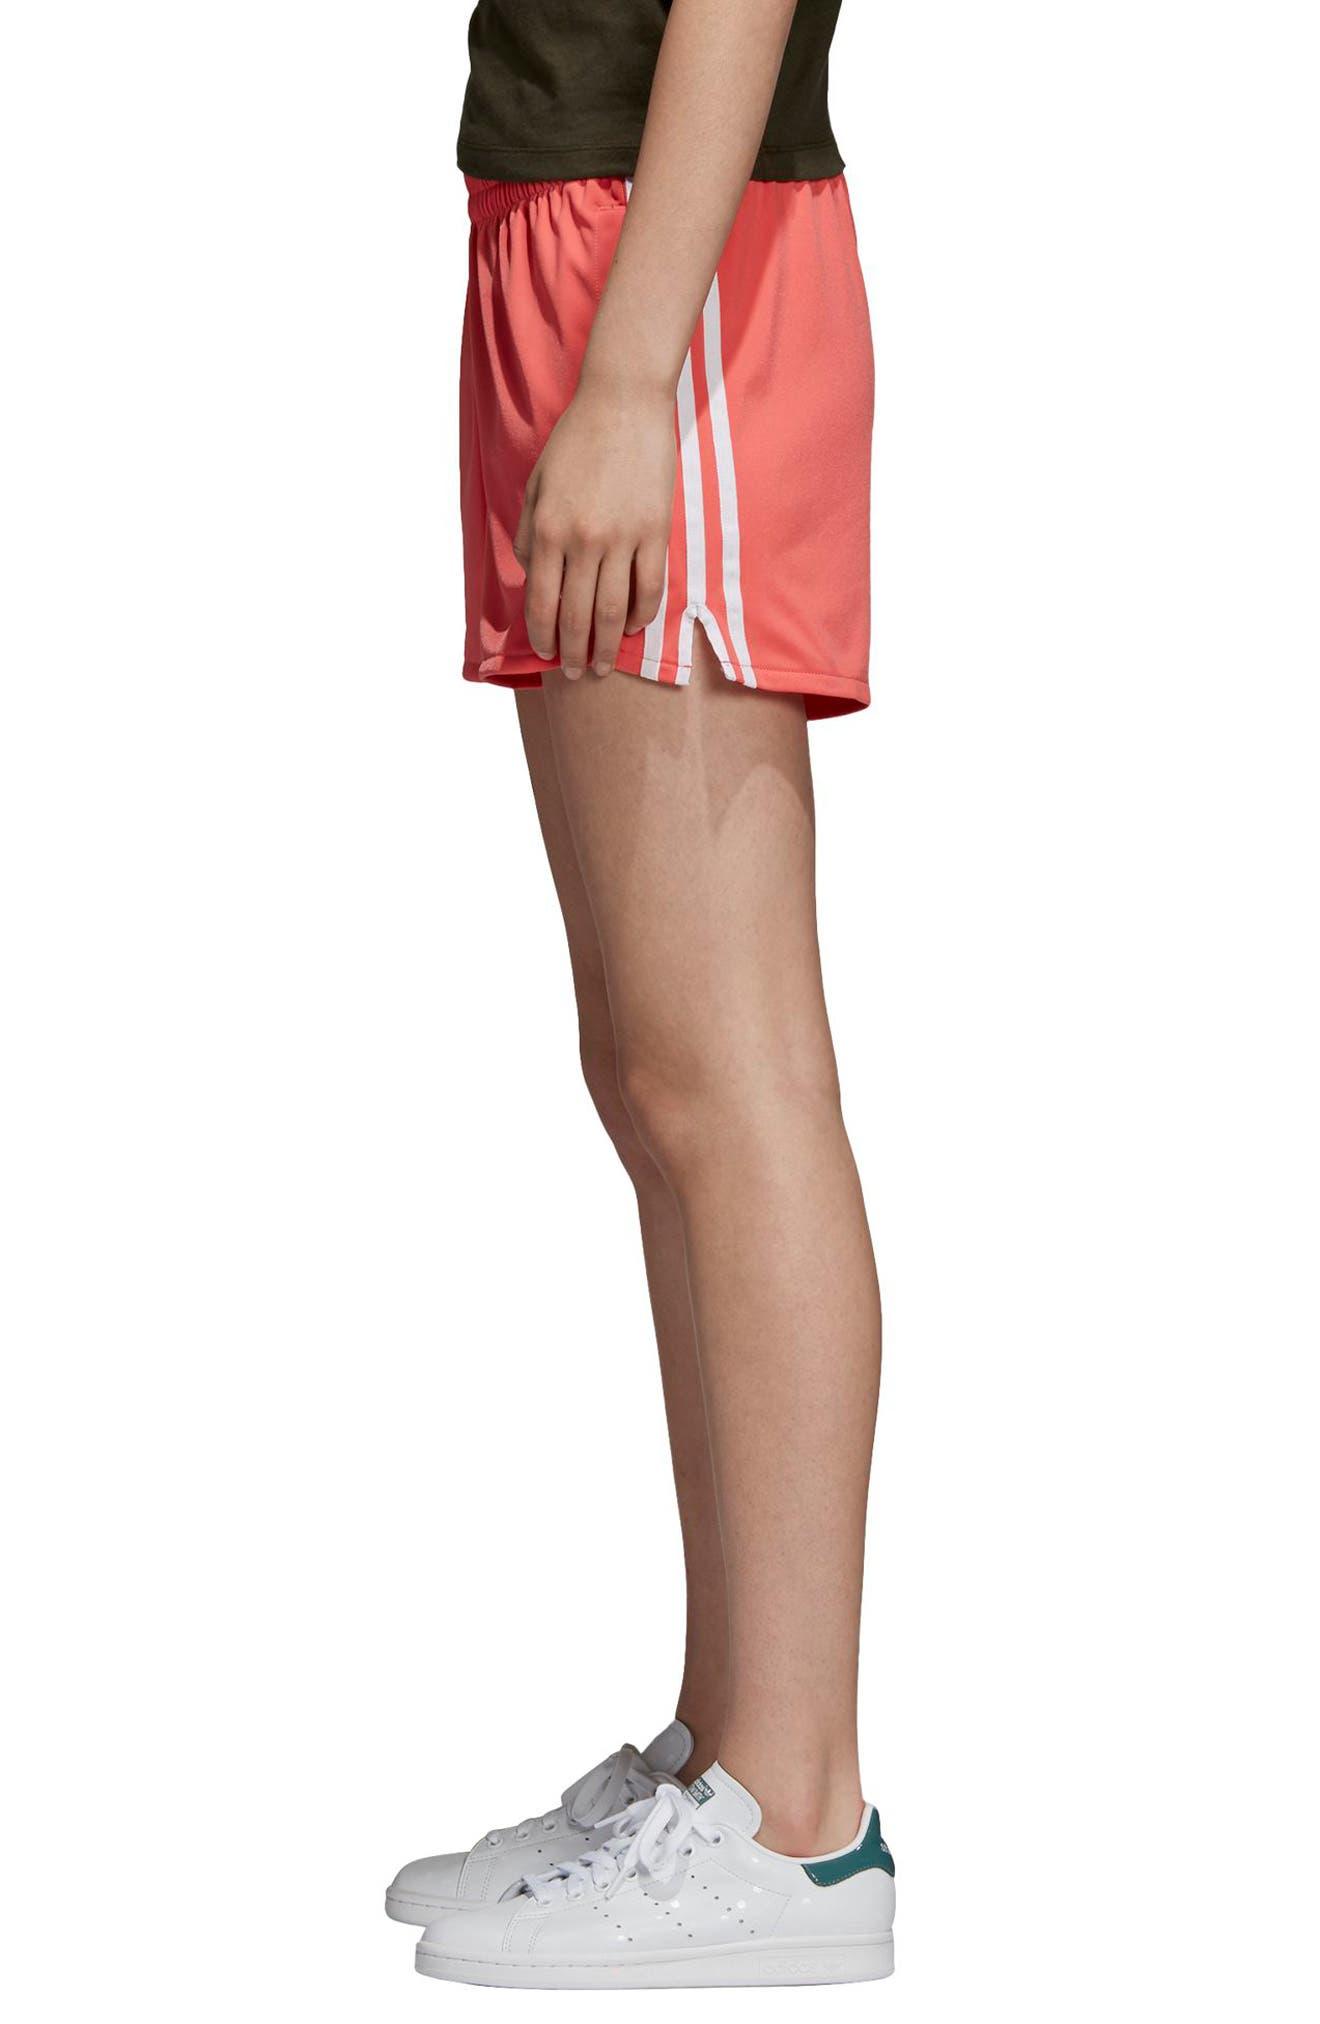 ADIDAS ORIGINALS,                             3-Stripes Shorts,                             Alternate thumbnail 3, color,                             600